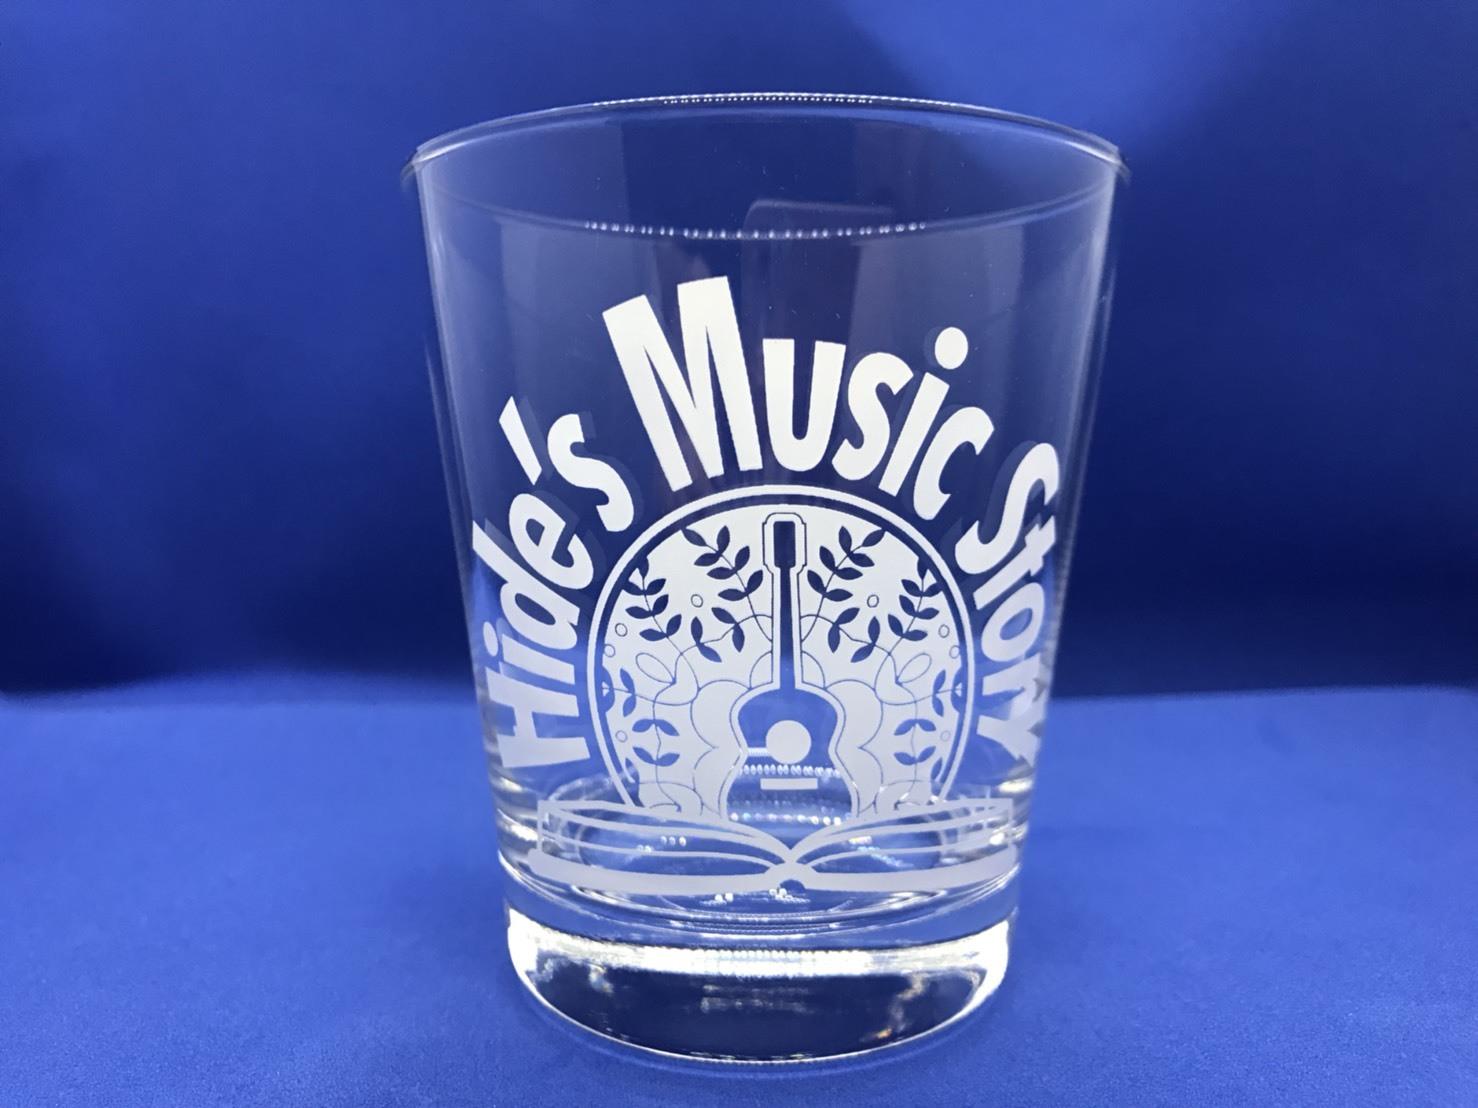 Hide's Music Story Original Glass (White)